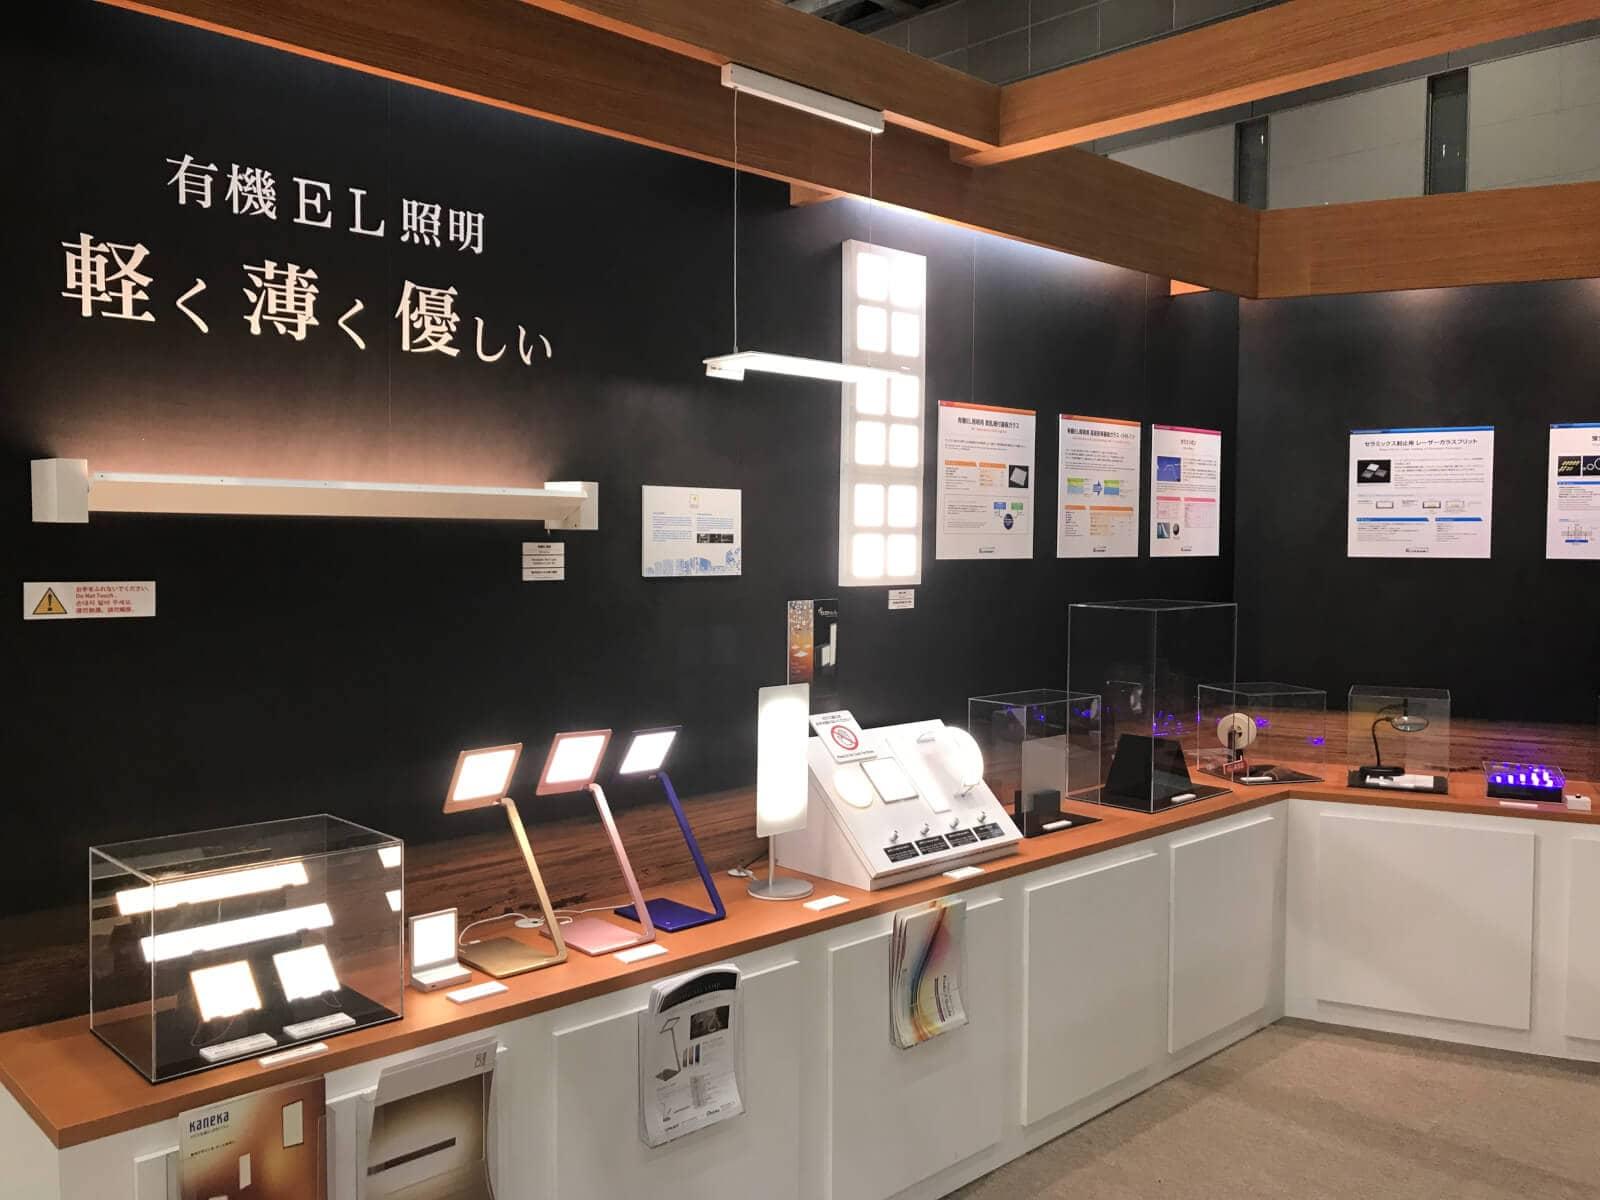 NEG booth at Lighting Fair Japan showing OLEDWorks OLED panels